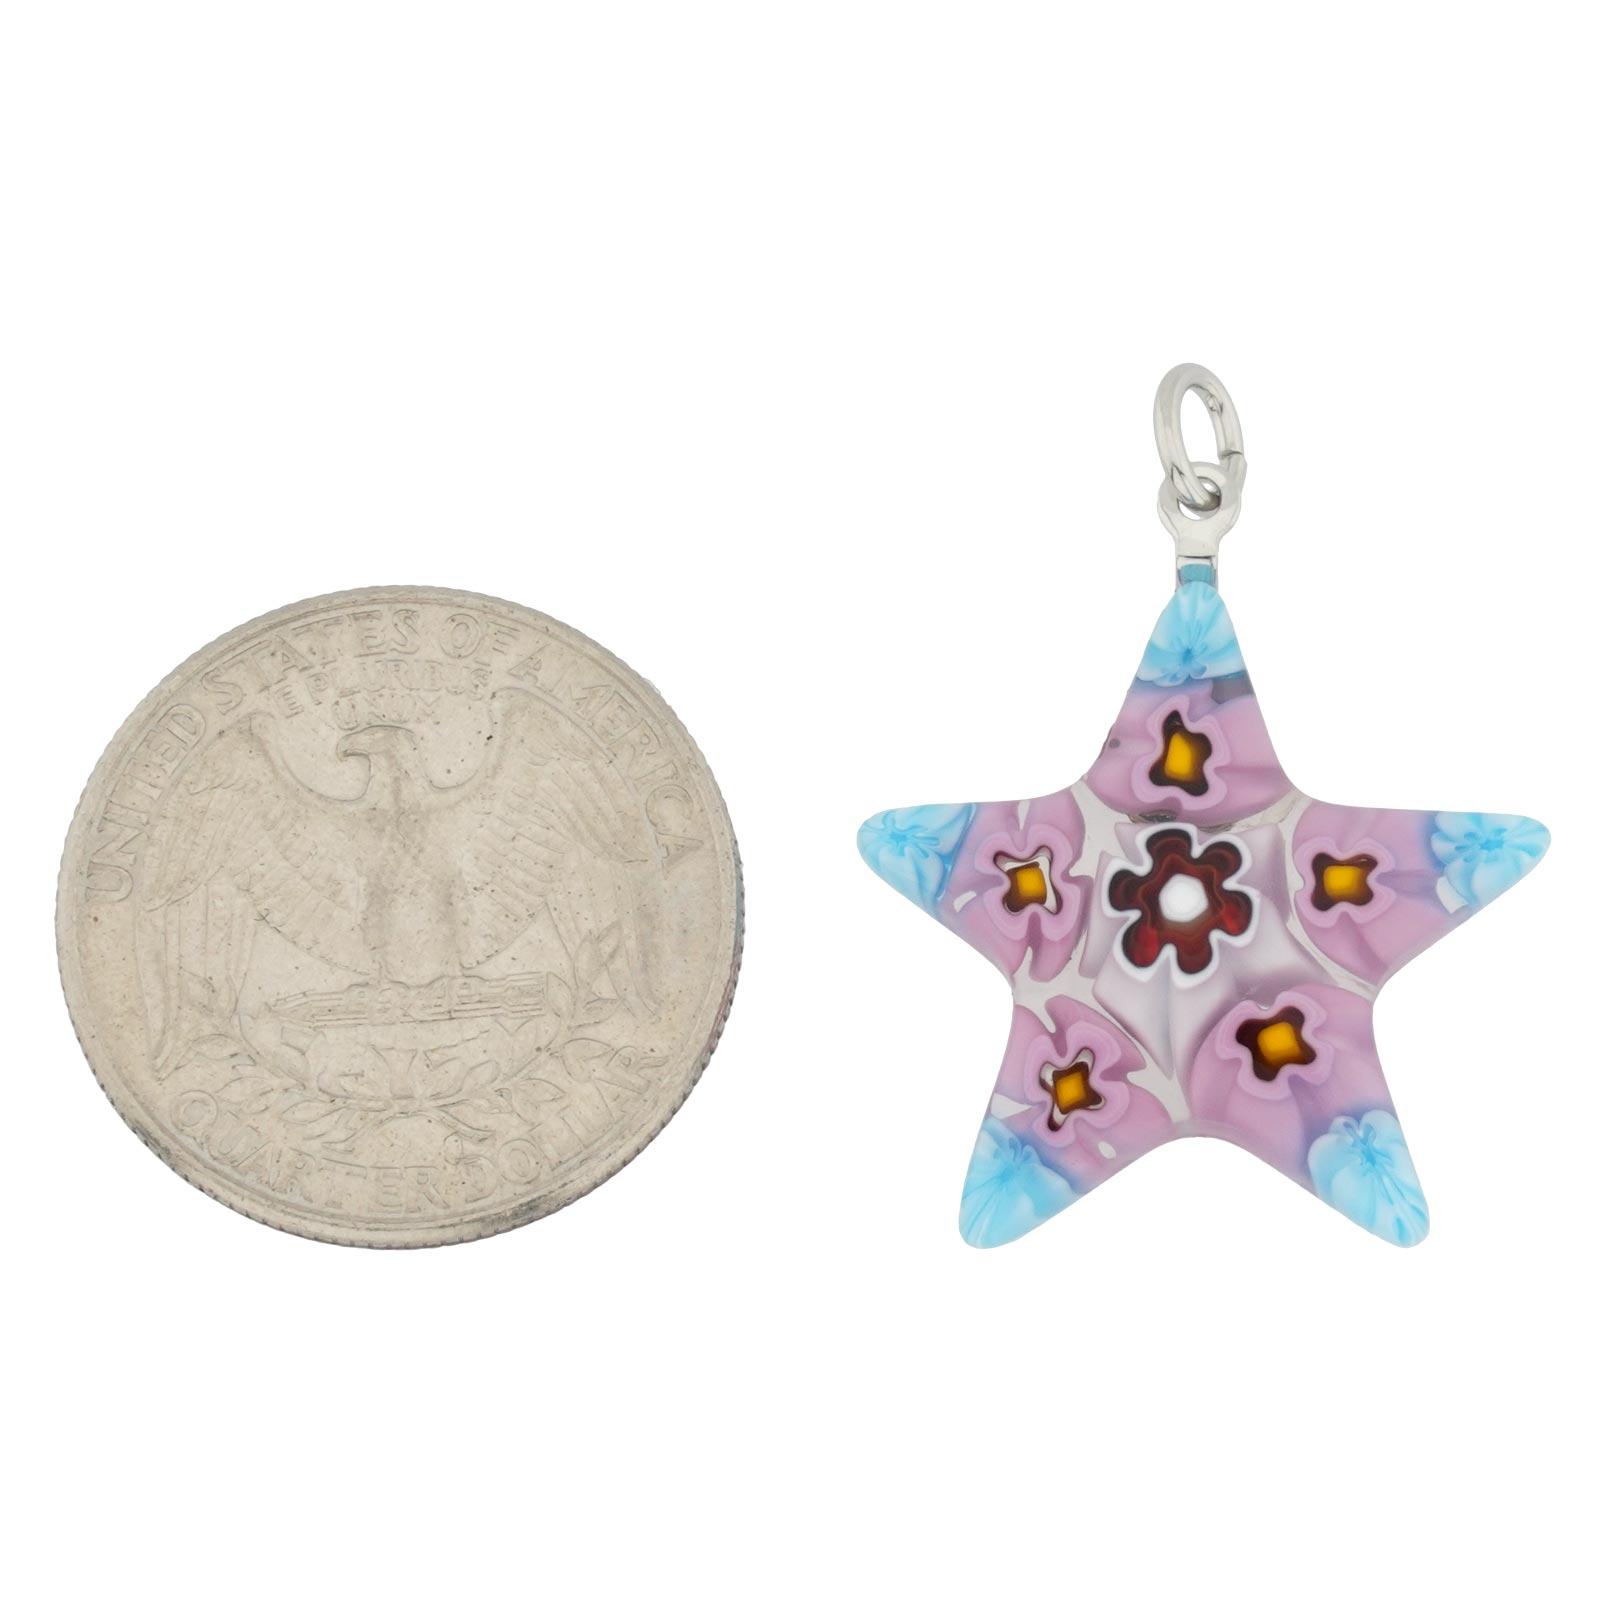 Millefiori Narrow Star Pendant